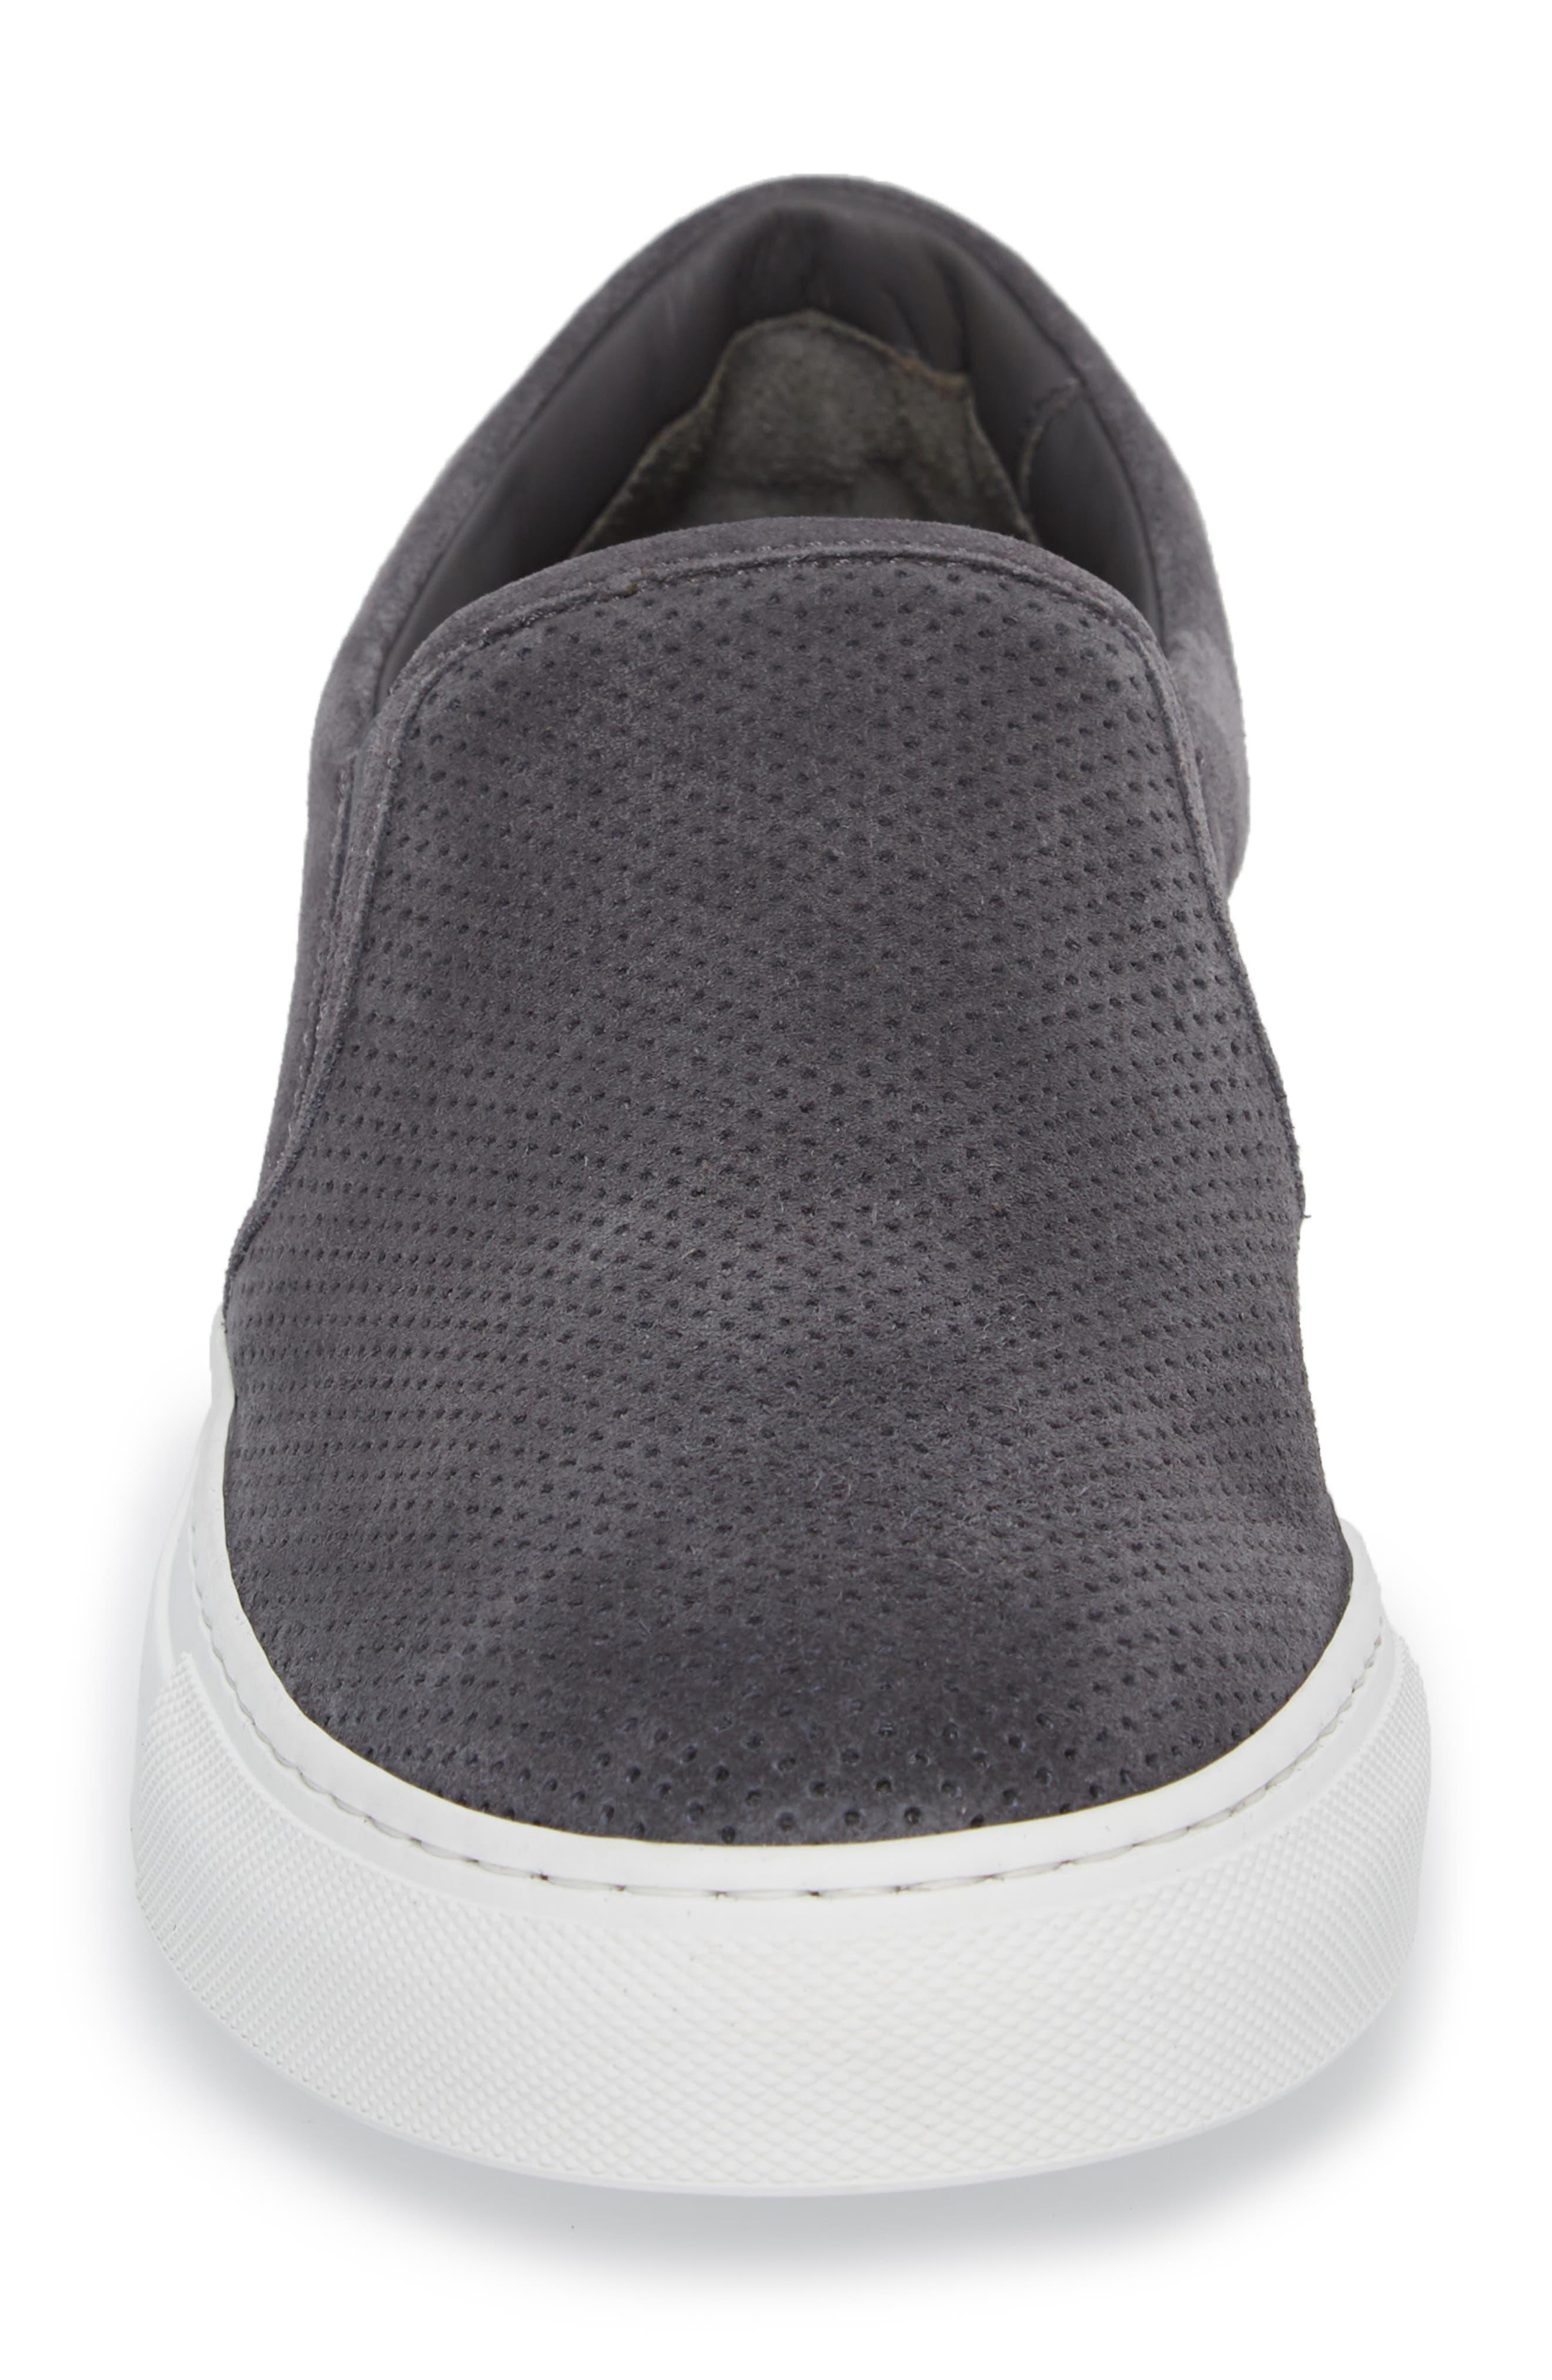 Buelton Perforated Slip-On Sneaker,                             Alternate thumbnail 4, color,                             Avion/ Tan Suede